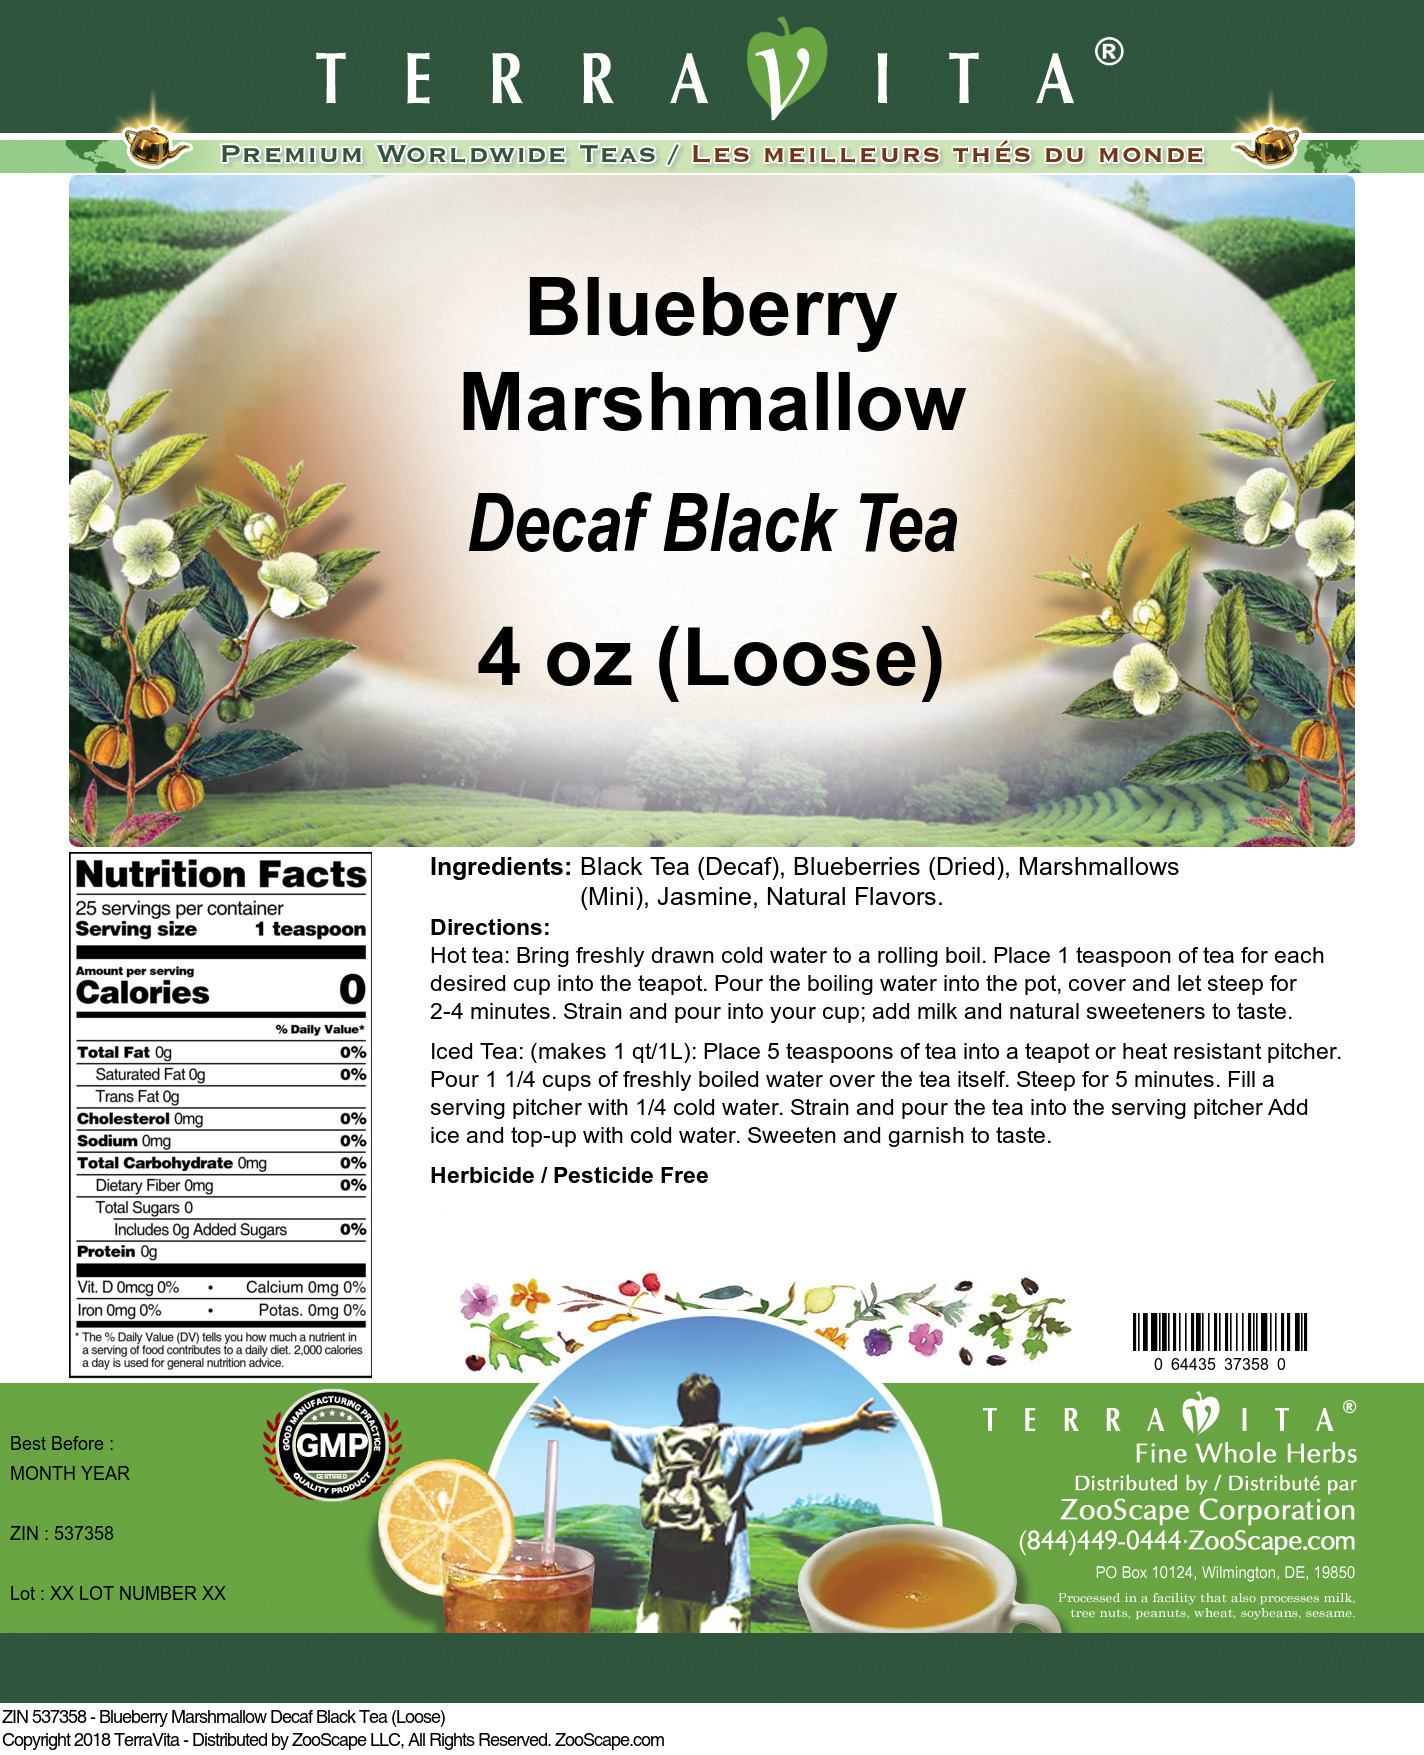 Blueberry Marshmallow Decaf Black Tea (Loose)